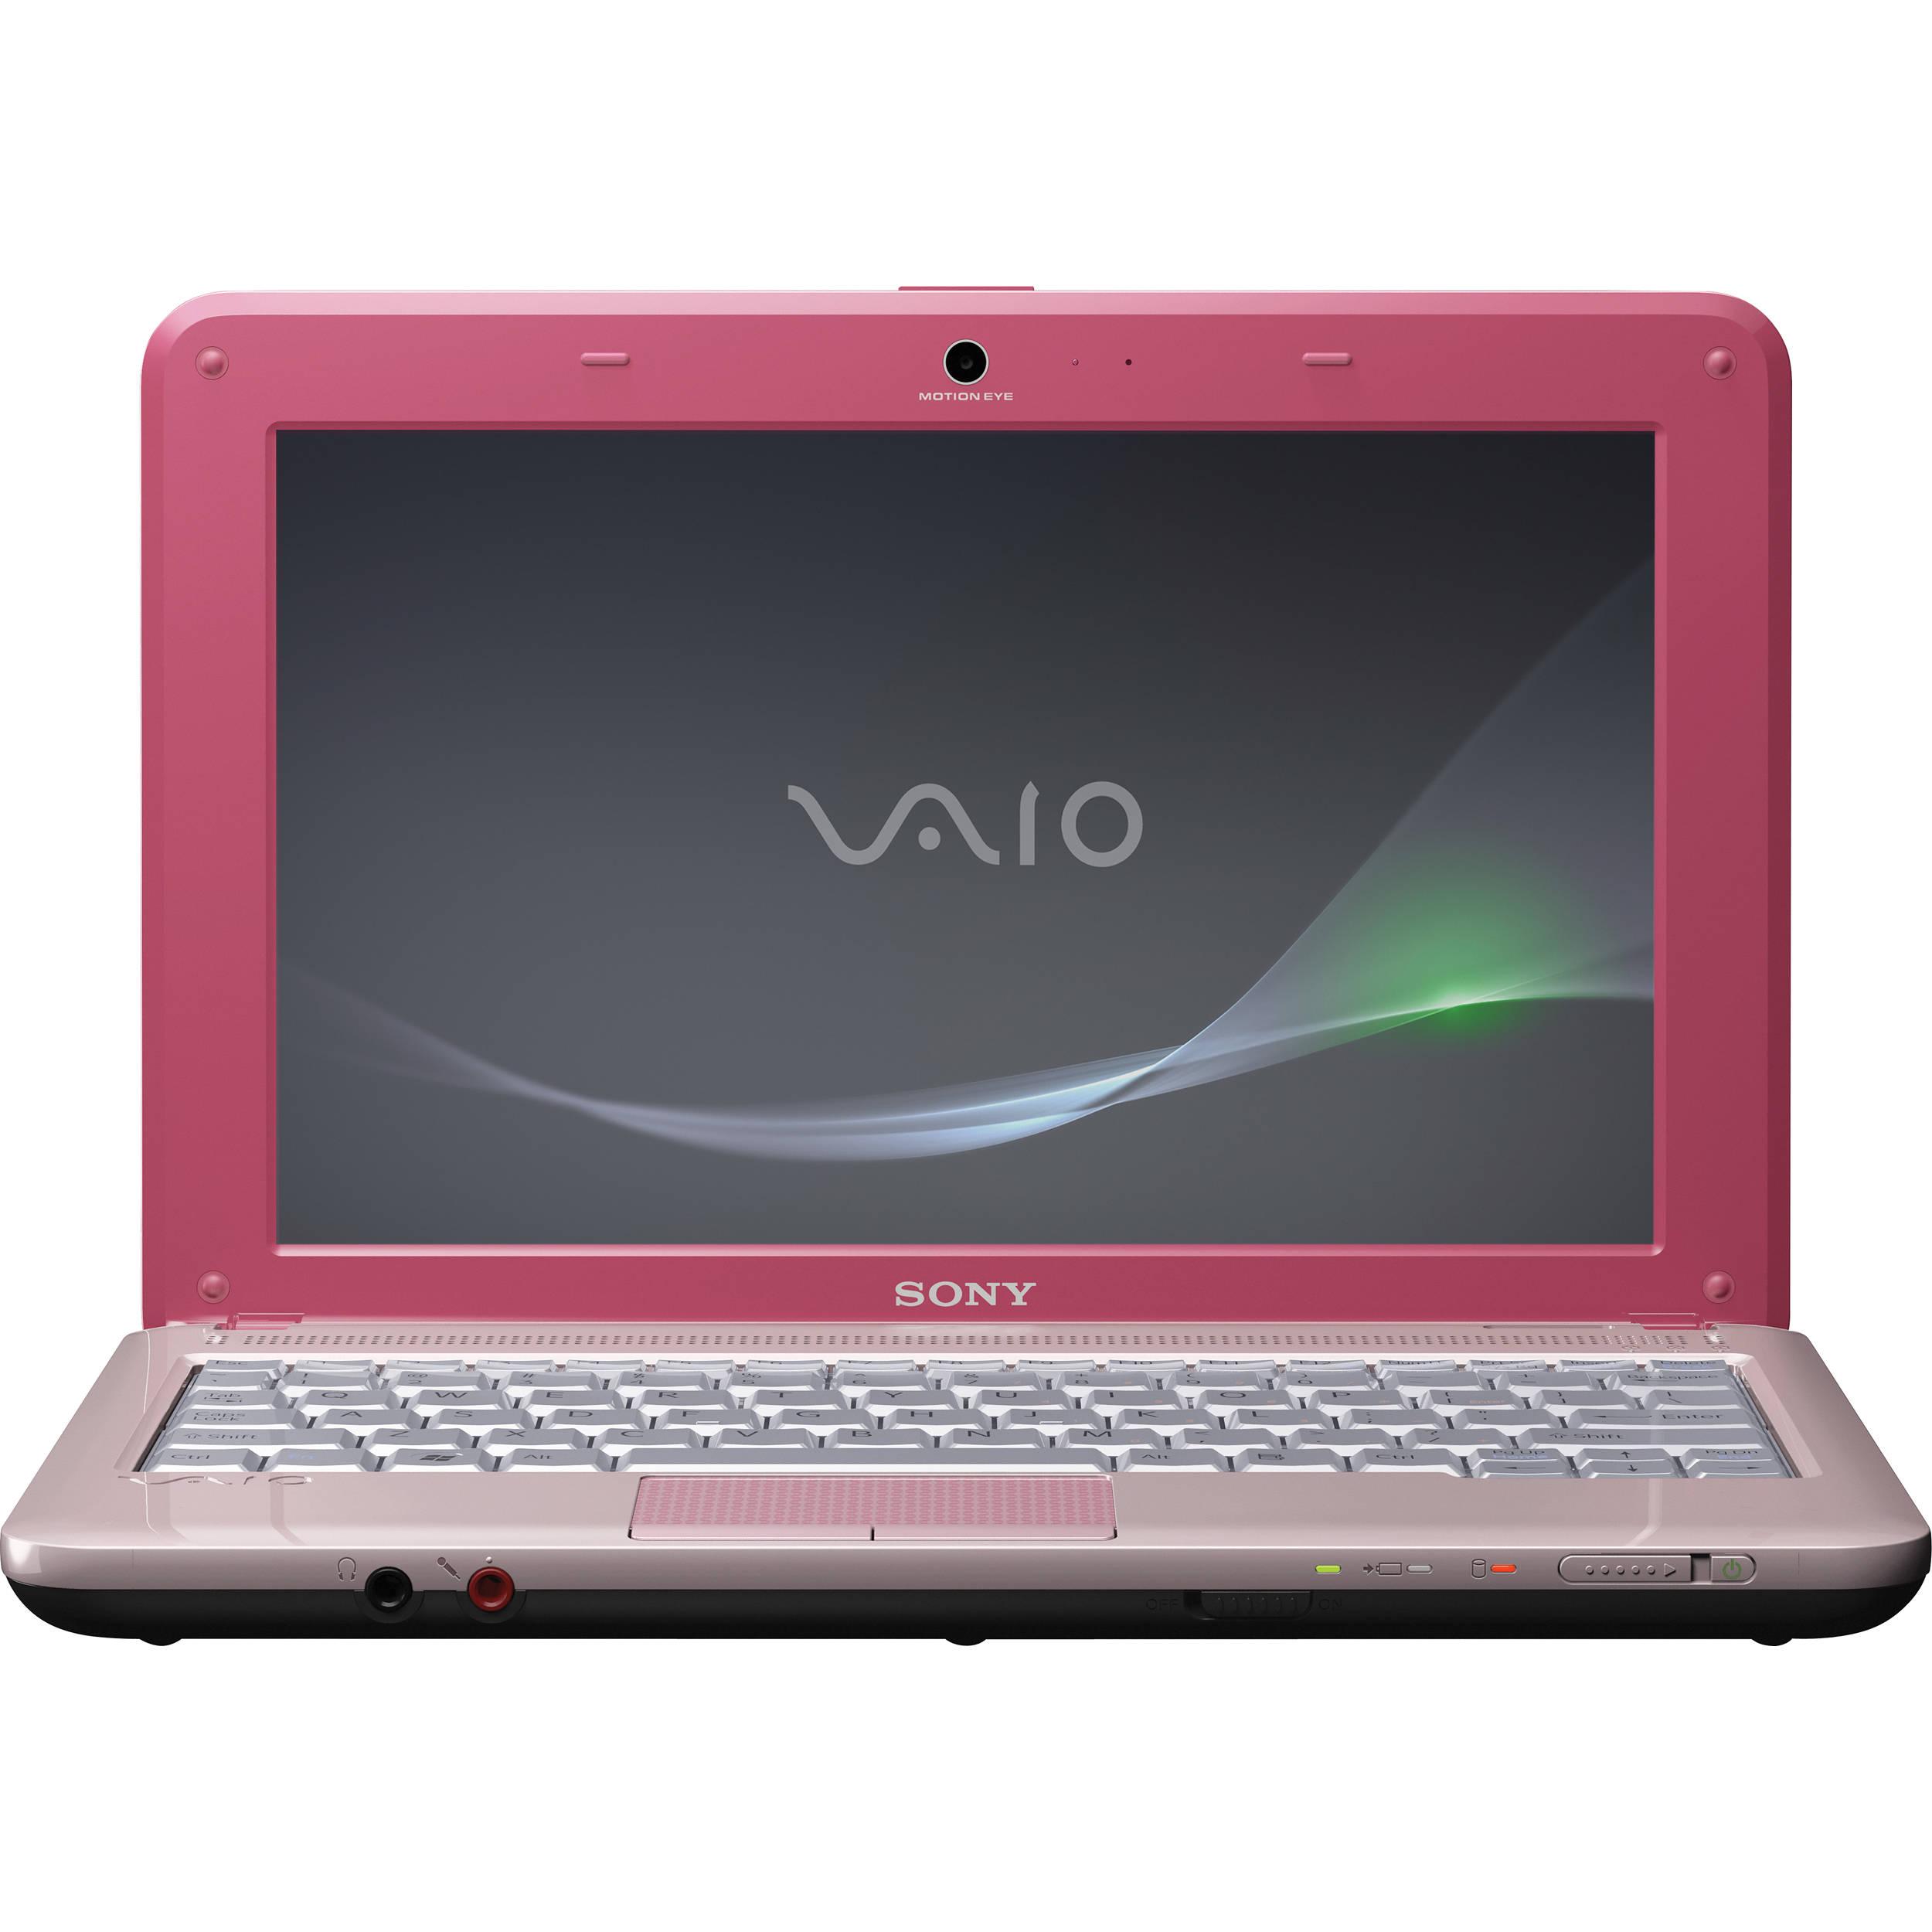 Sony Vaio VPCM121AX/P Notebook Drivers Update